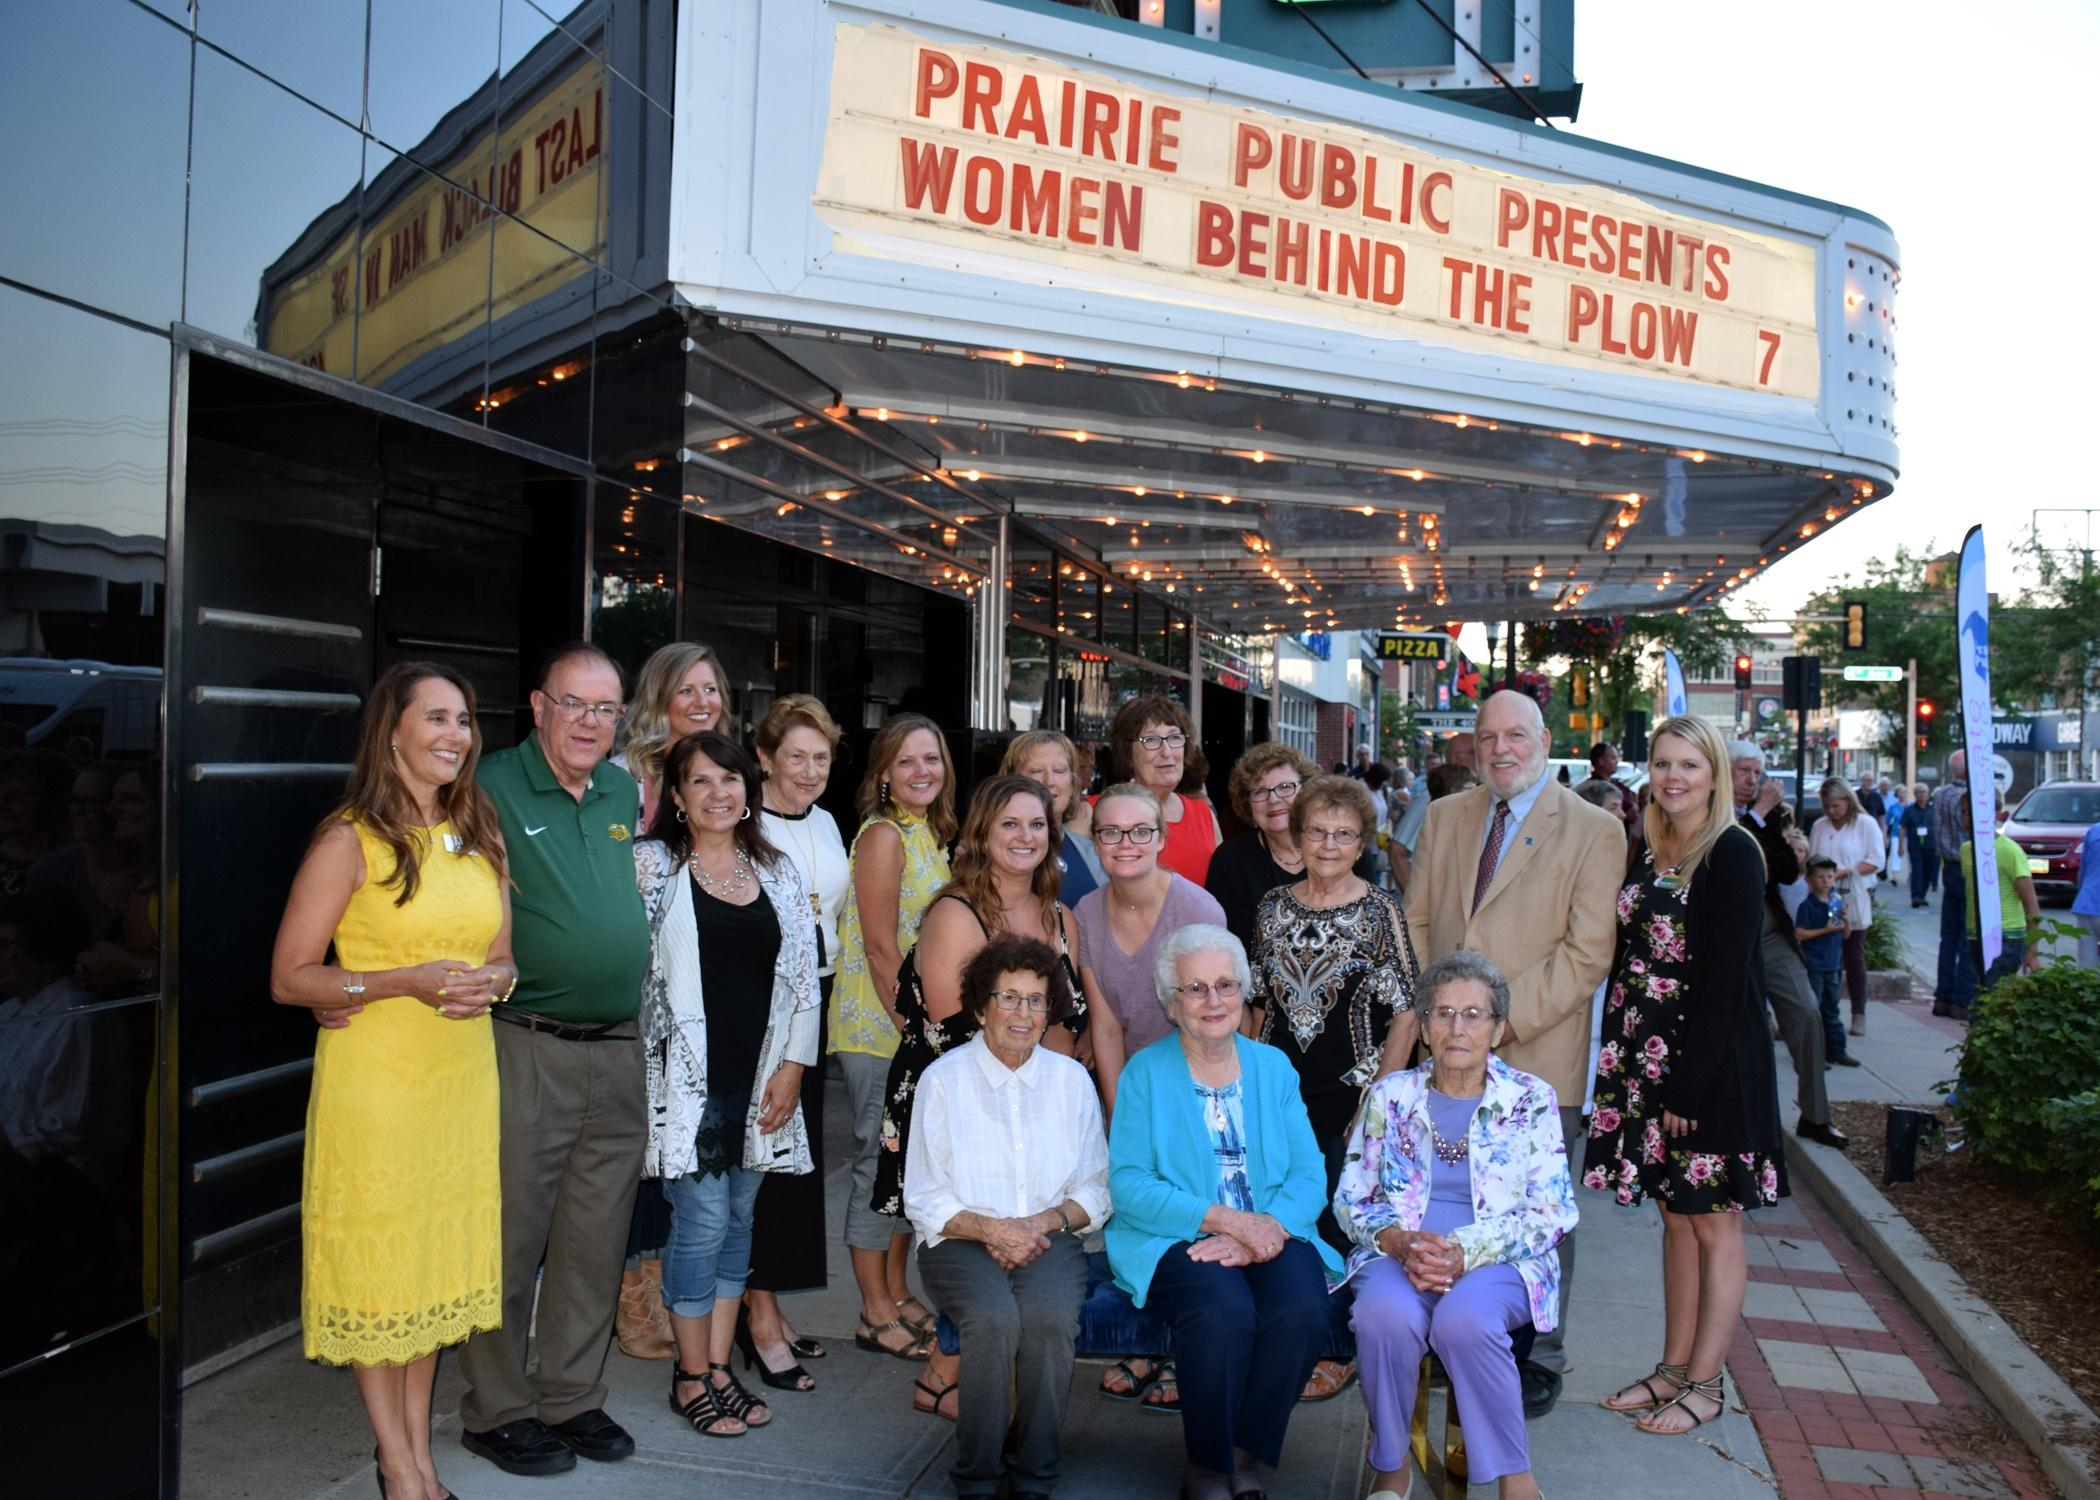 Women Behind The Plow - Fargo Theatre Premiere